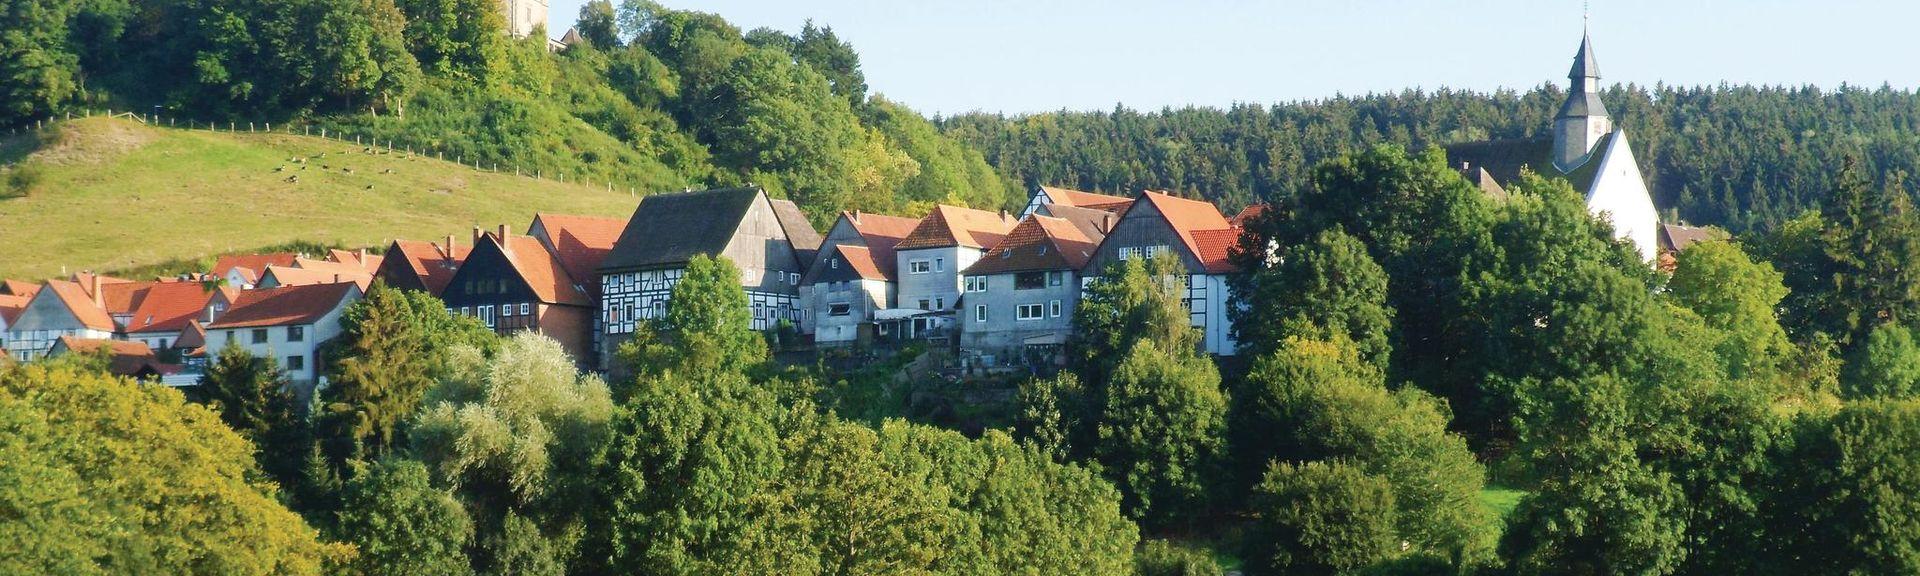 Luegde, Renania del Norte-Westfalia, Alemania